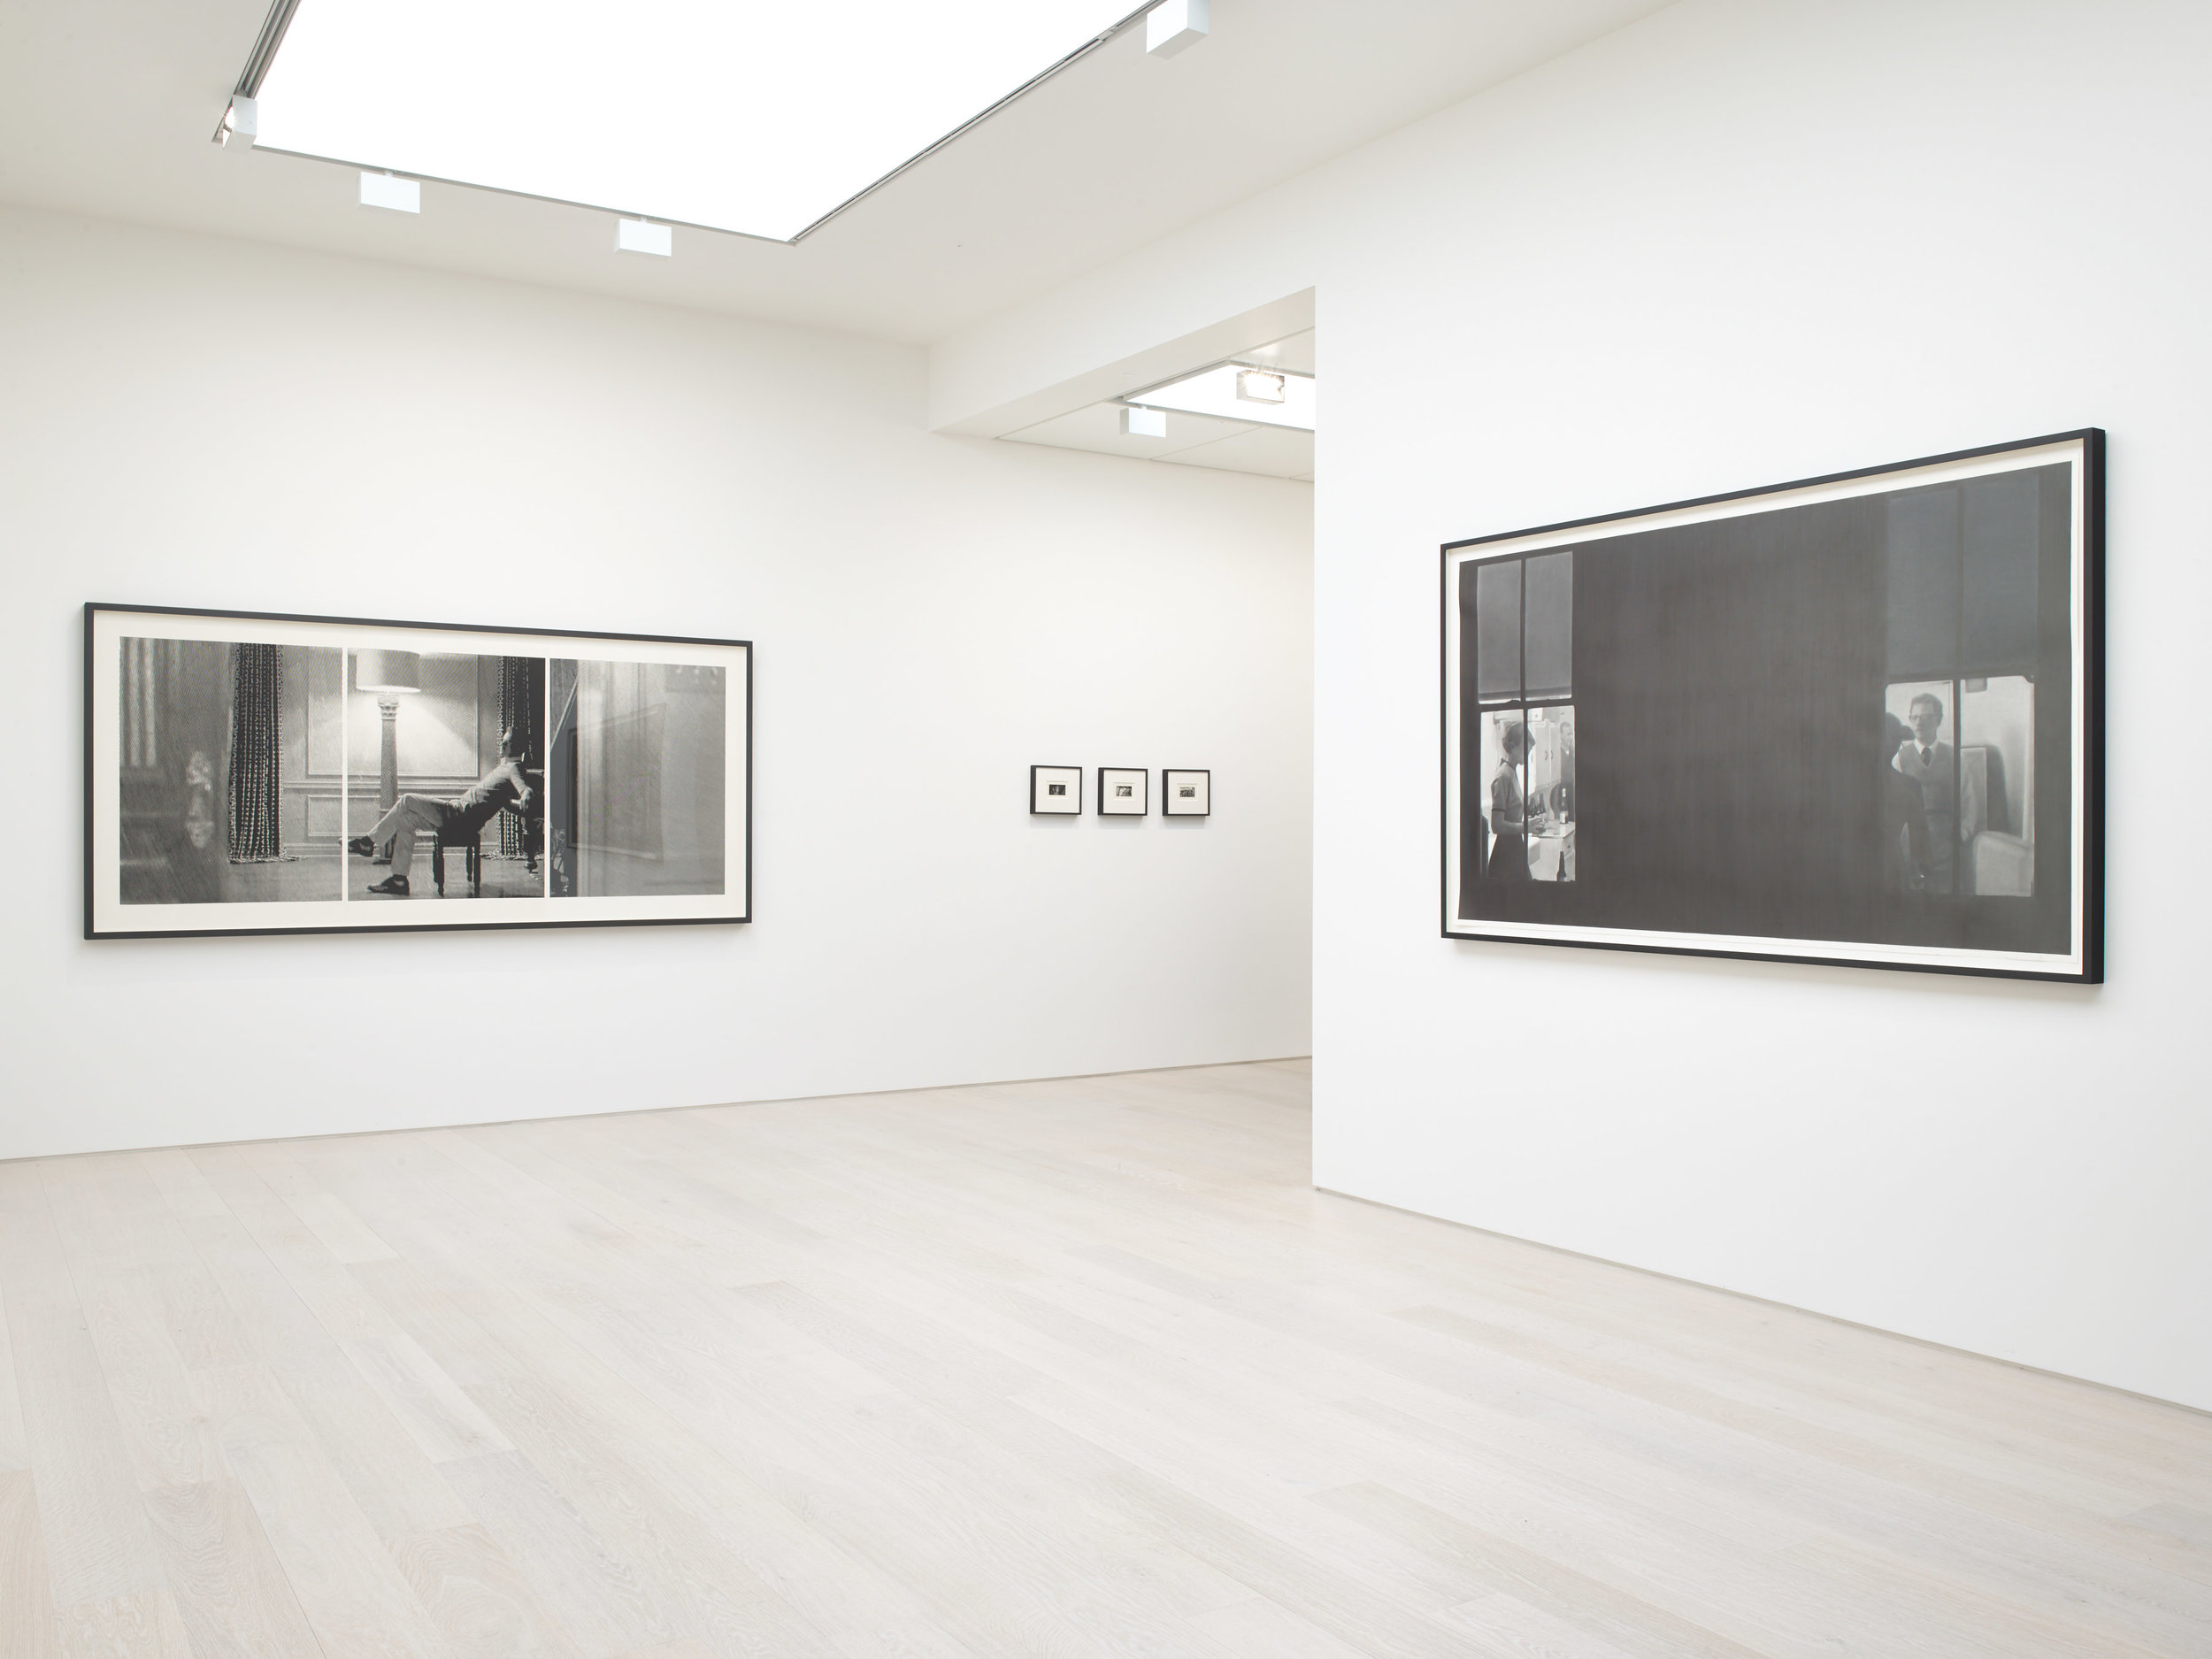 Marie Harnett_Still_Alan Cristea Gallery 2017 installation. Photo Stephe...-9.jpg